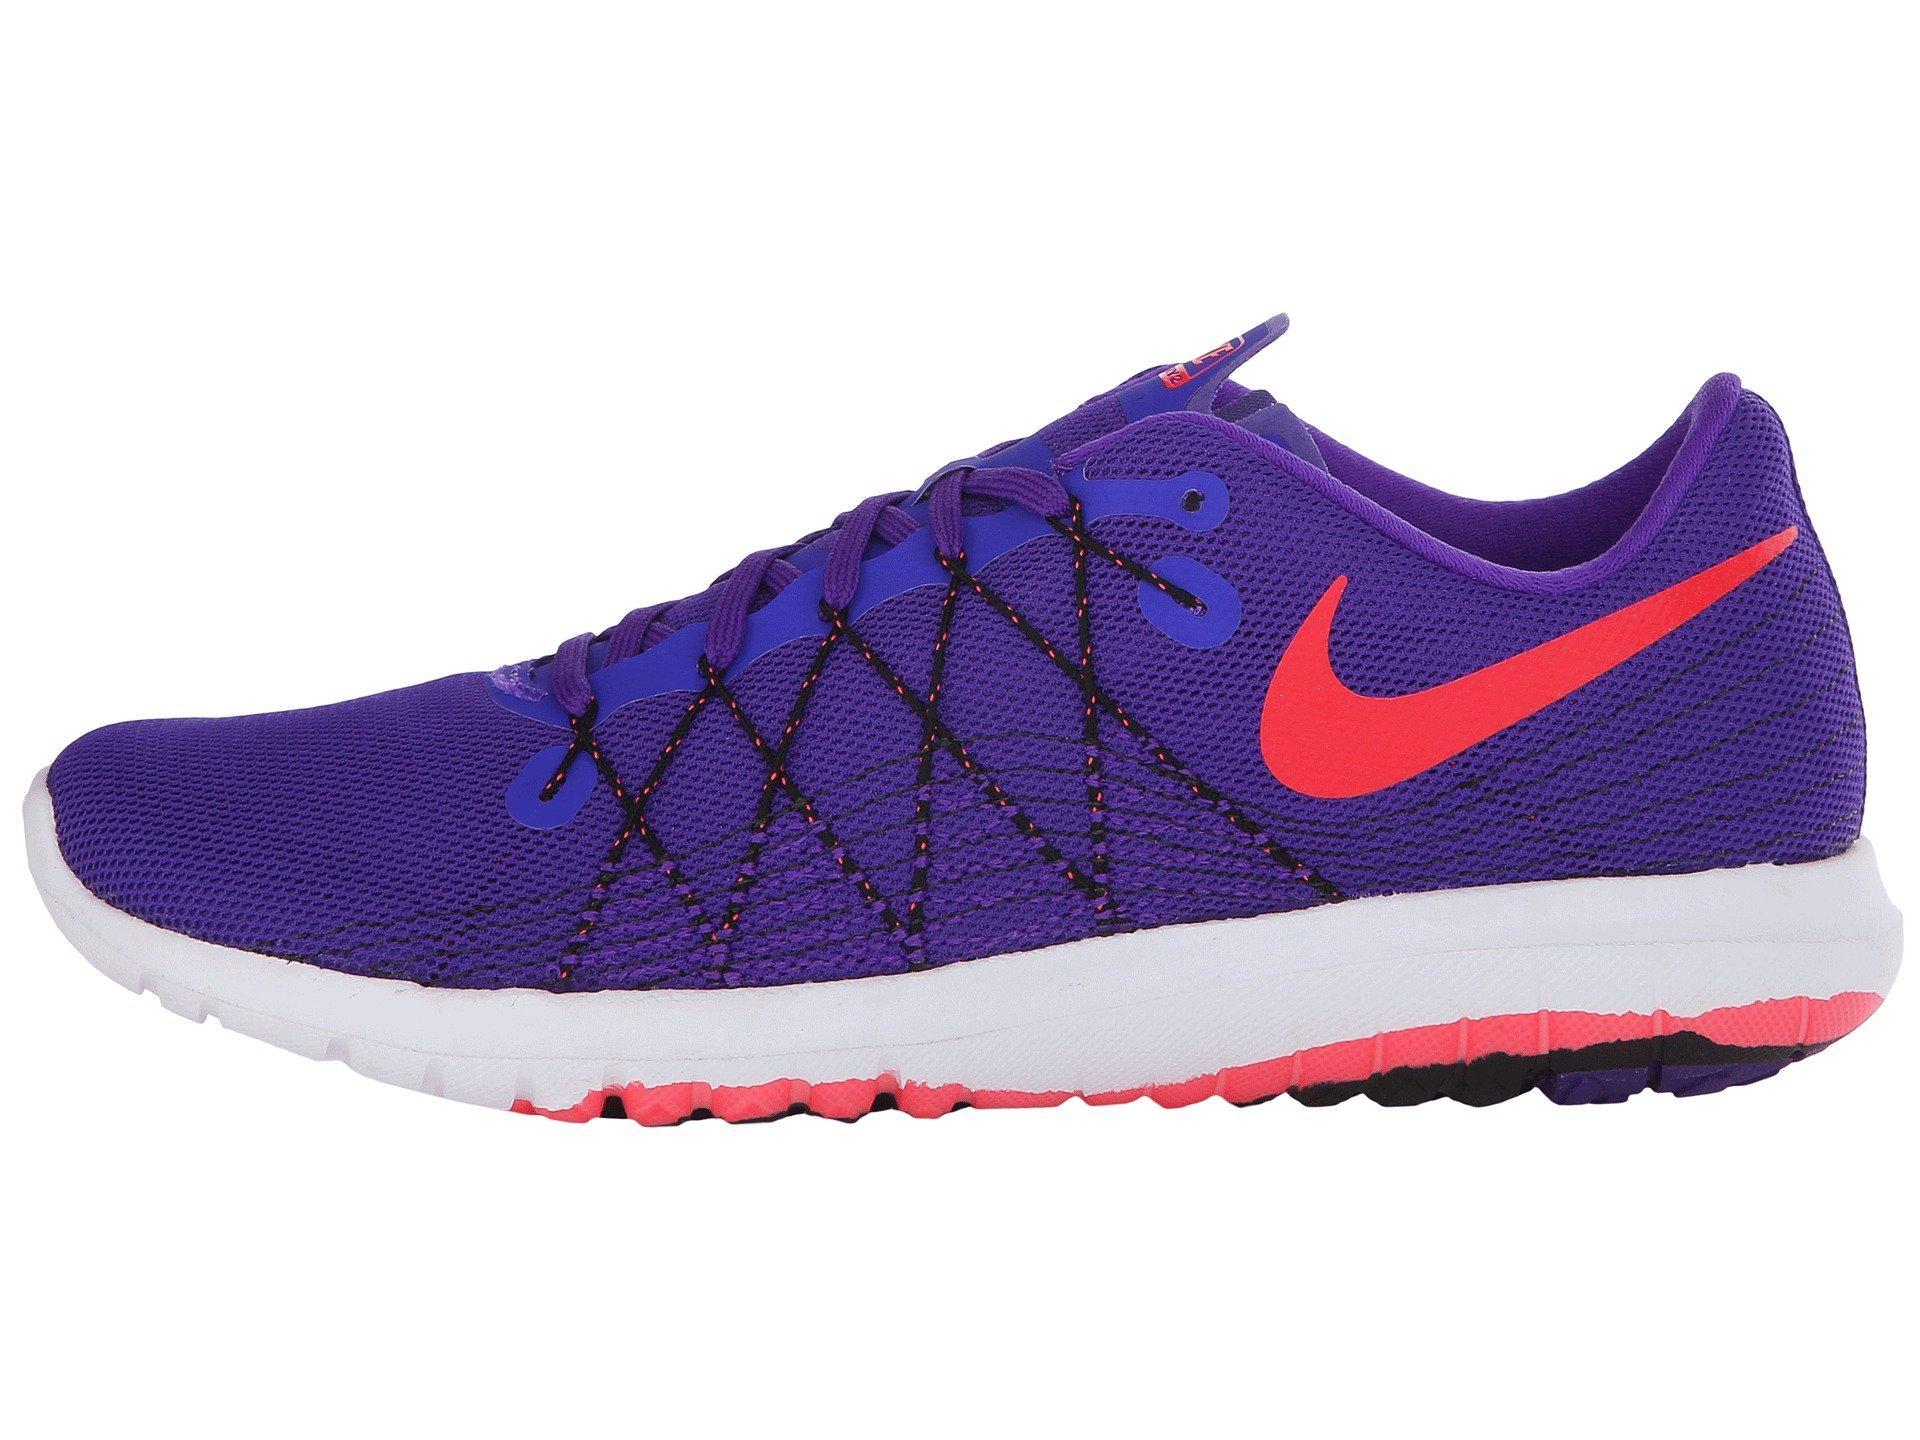 size 40 c0e5b 461eb Nike , Fierce Purple Black White Bright Crimson